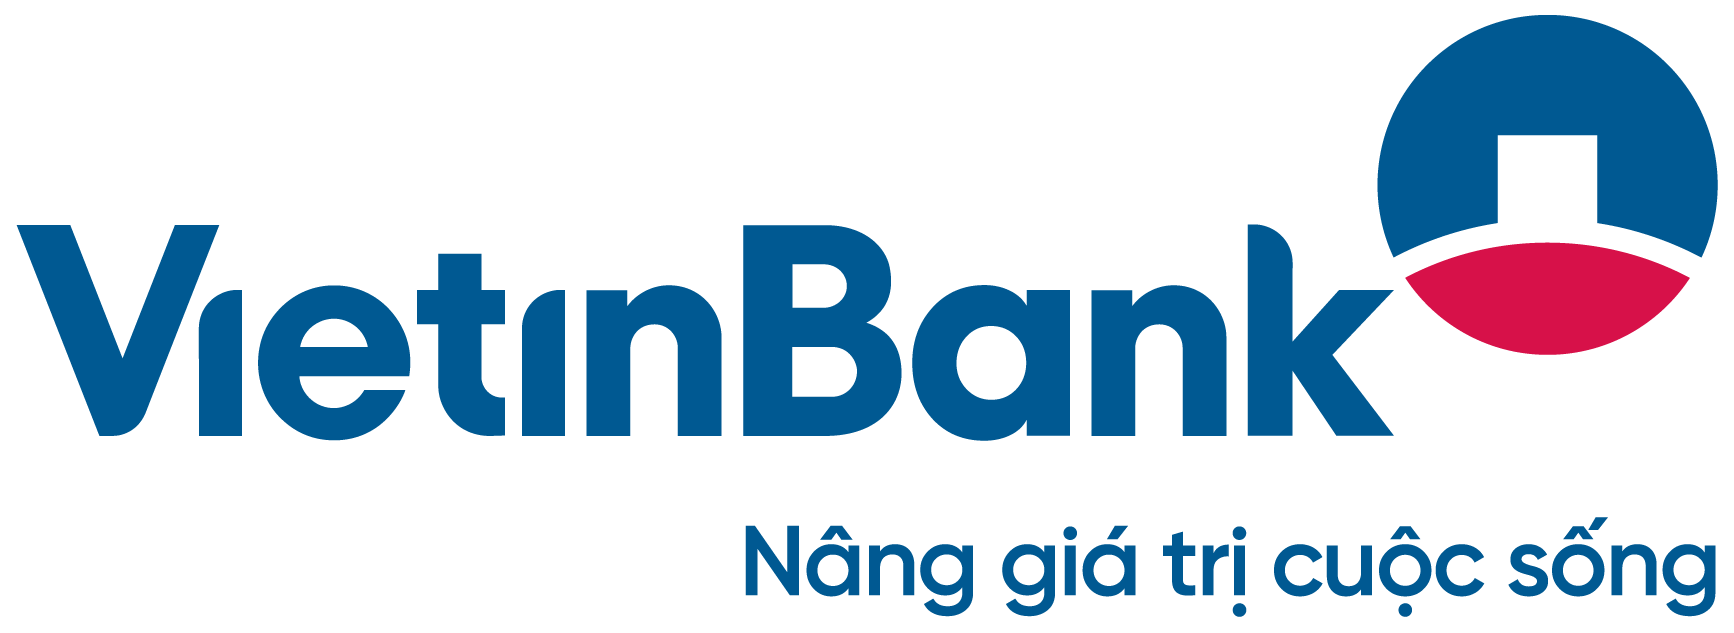 logo viettinbank - Tập đoàn CEO